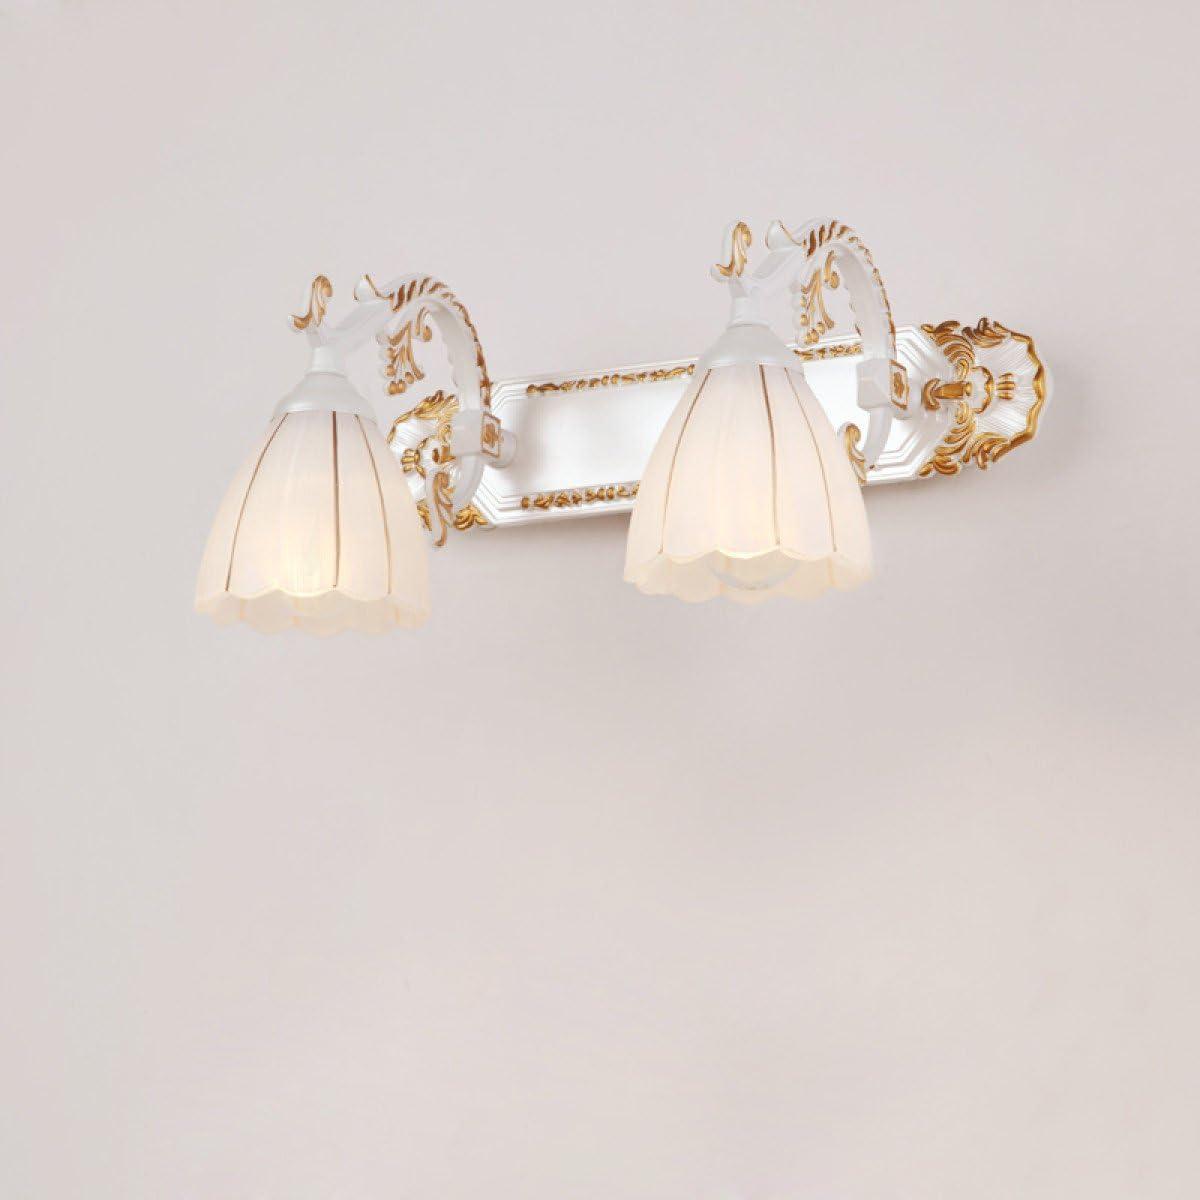 European Mirror Headlight Cabinet New color Elegant Bathroom LightsToilet